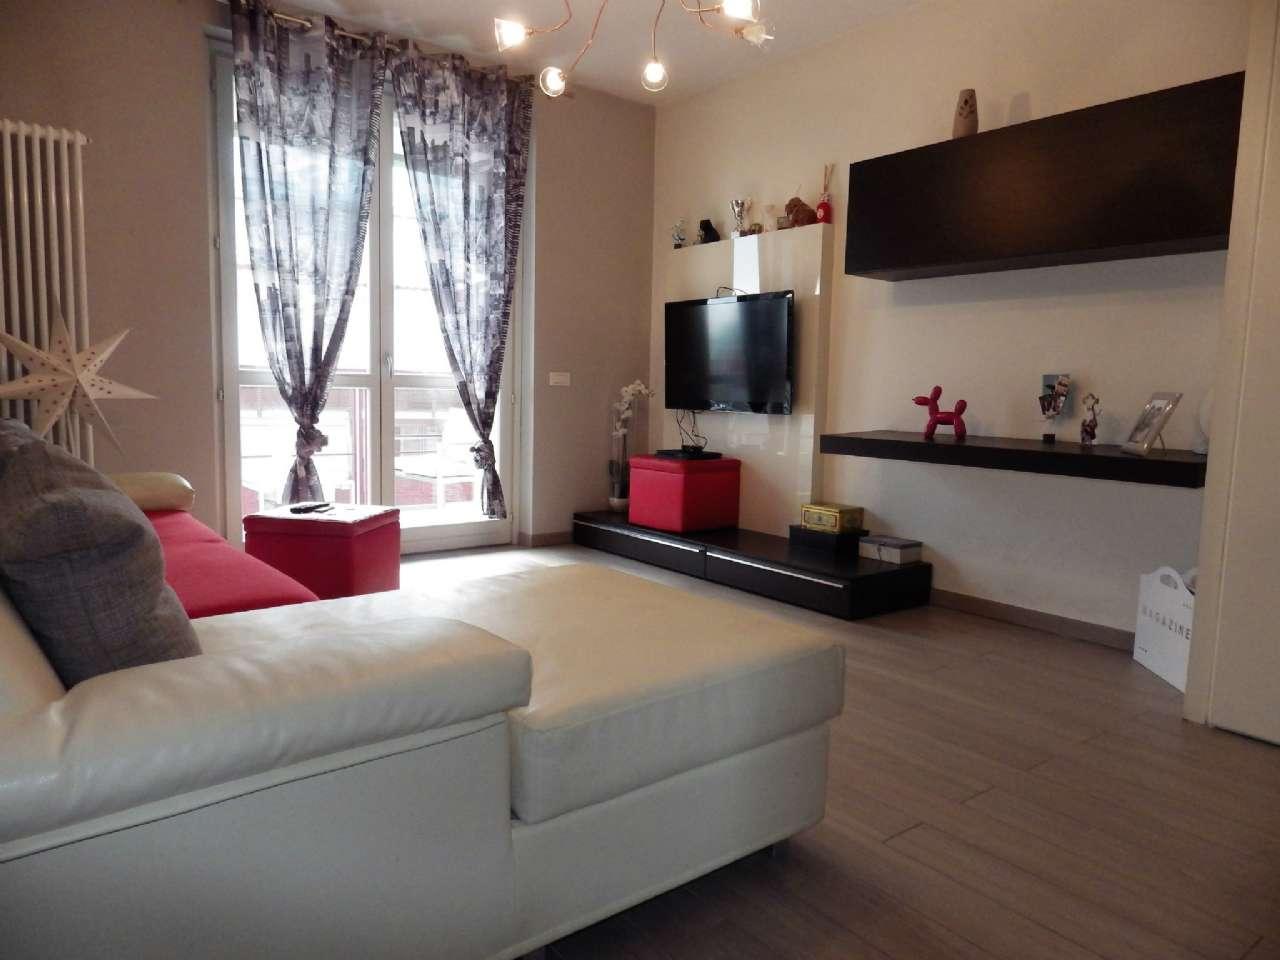 Appartamento In Vendita A Grugliasco Rif Cg 2243